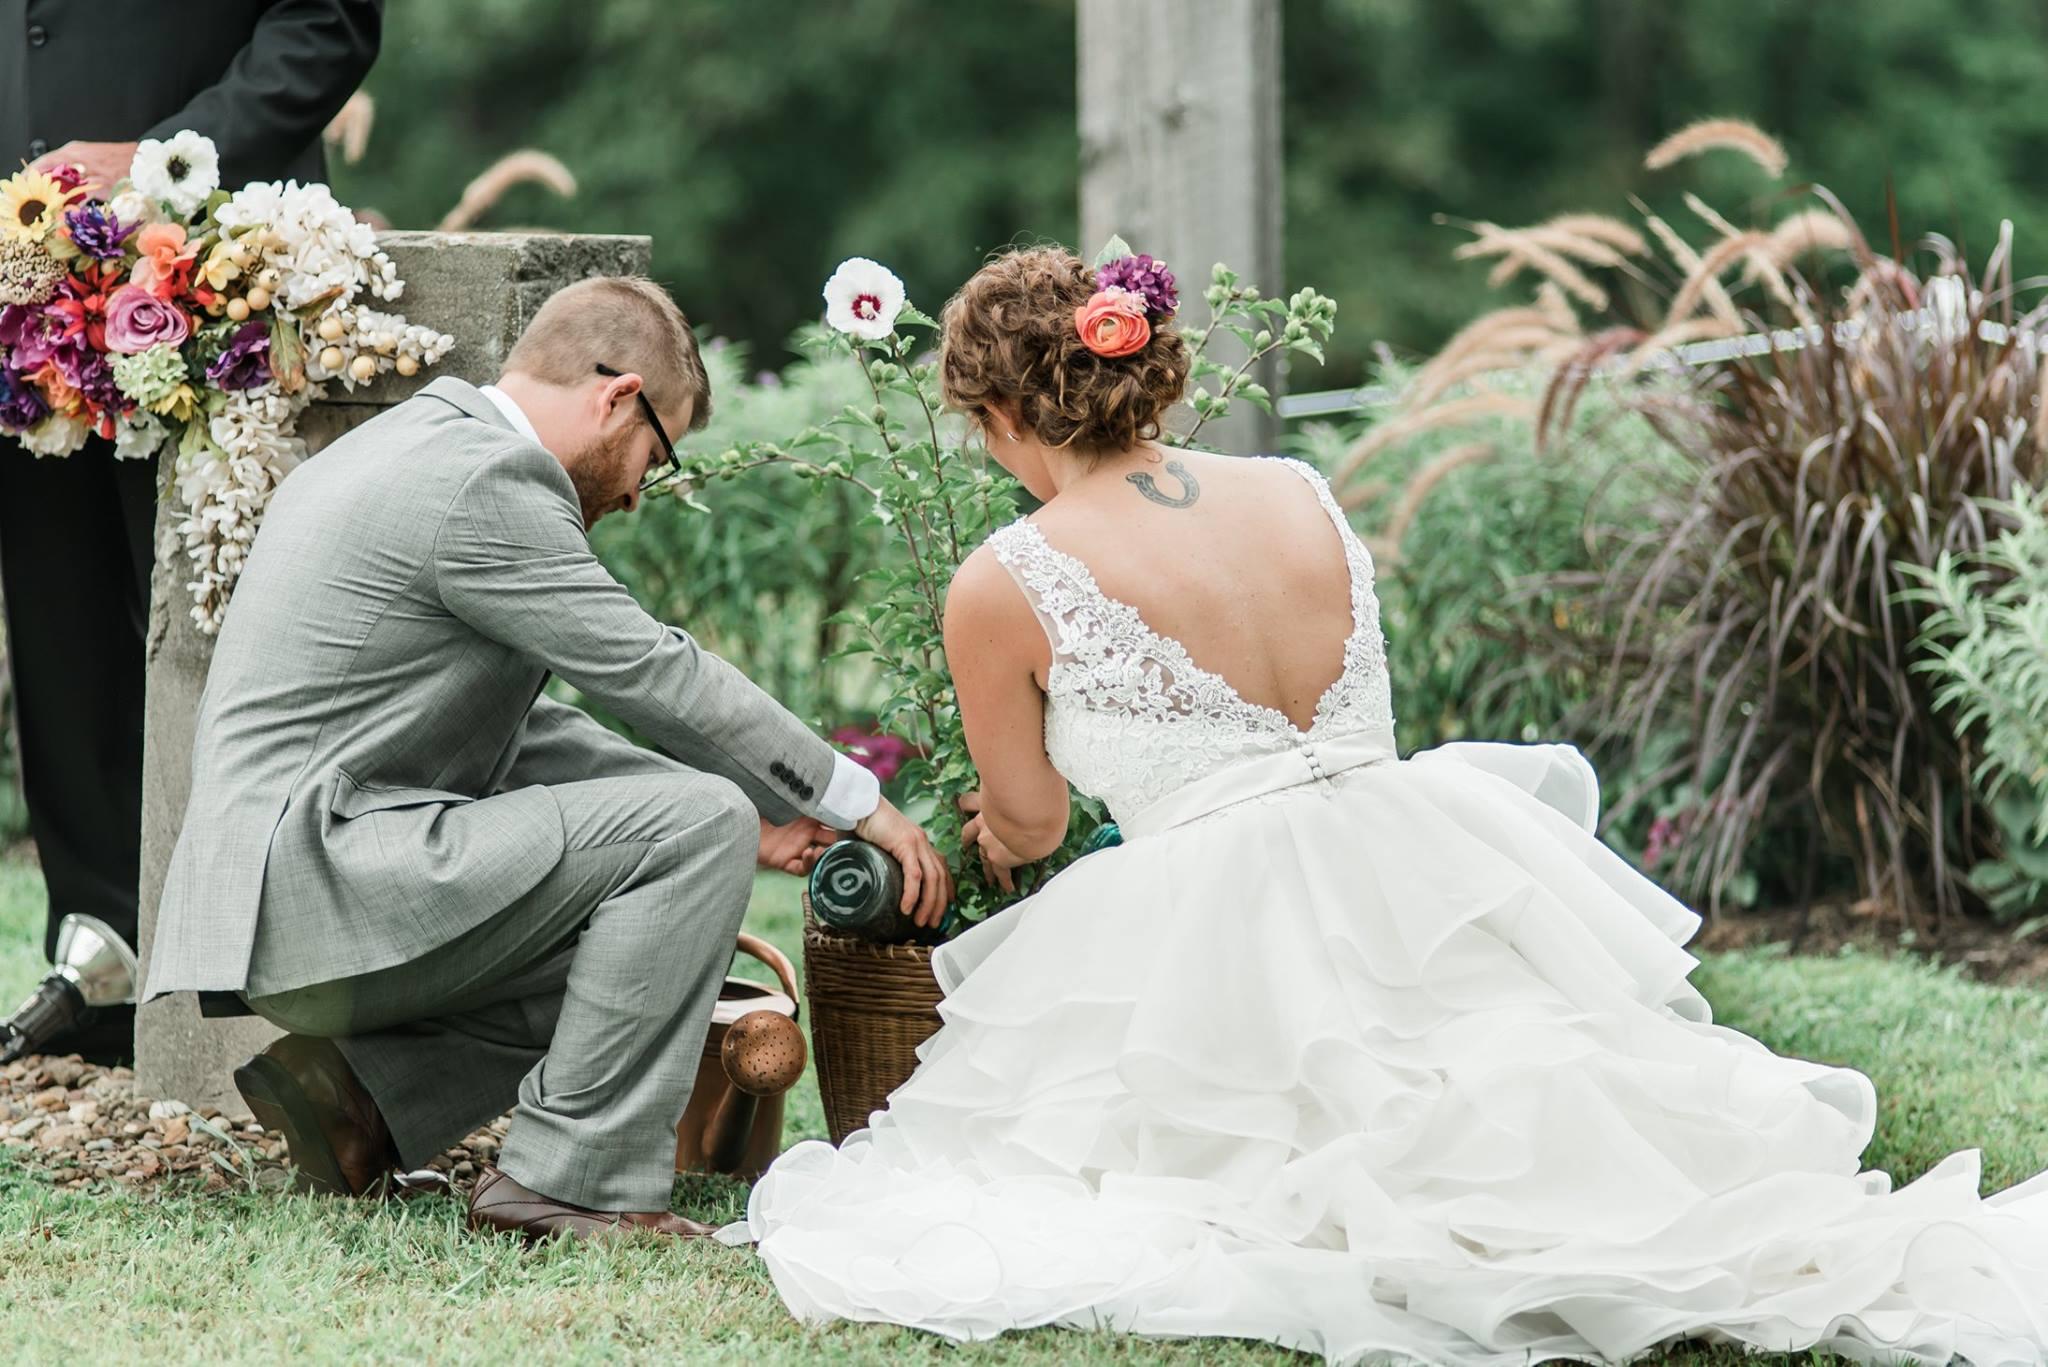 pennsylvania-backyard-wedding-love-diy-bohemian-romantic-colorful-0027.jpg